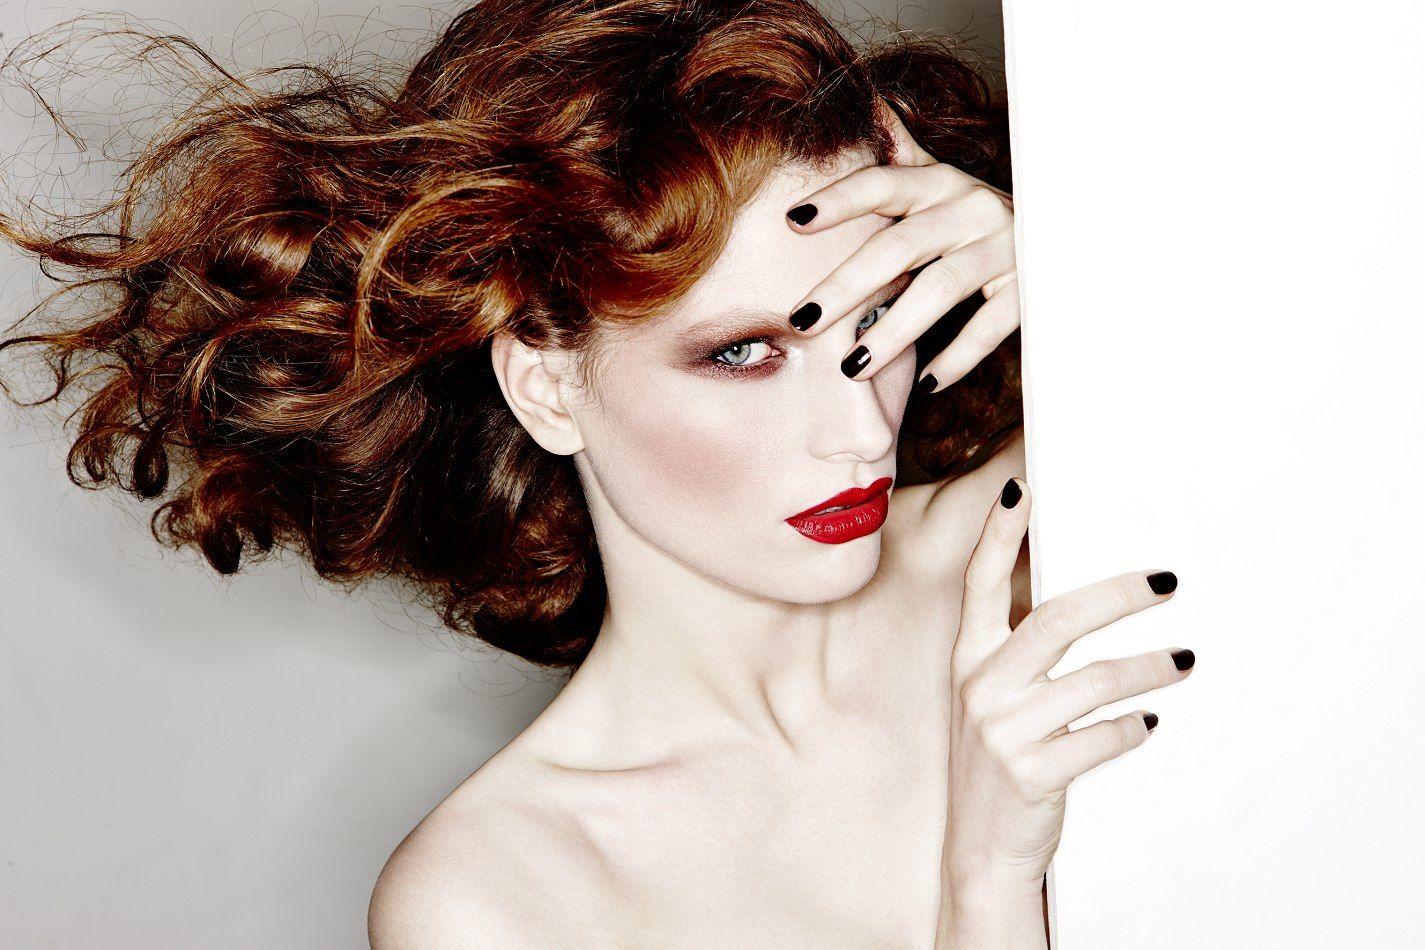 Topless photoset of sabine jemeljanova,CelebGate Amanda Seyfried Naked  Sex clips Kate upton sexy 27 Photos,Christine Burke hot. 2018-2019 celebrityes photos leaks!